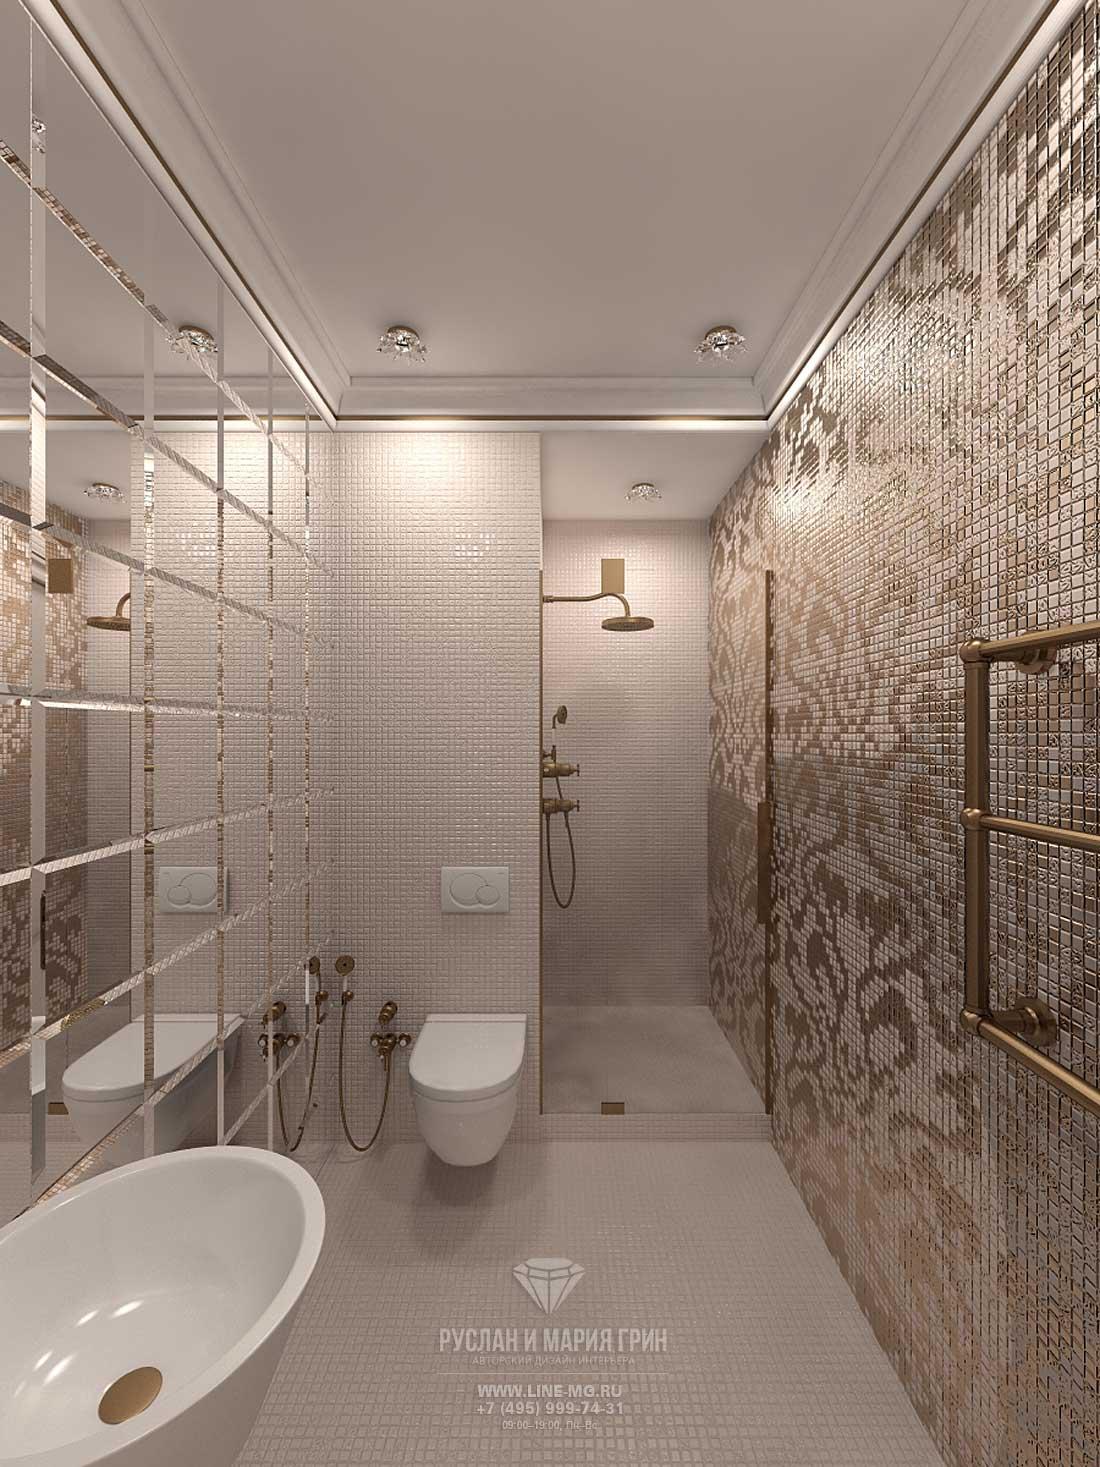 Дизайн гостевого санузла. Квартира в ЖК «Сколково Парк»